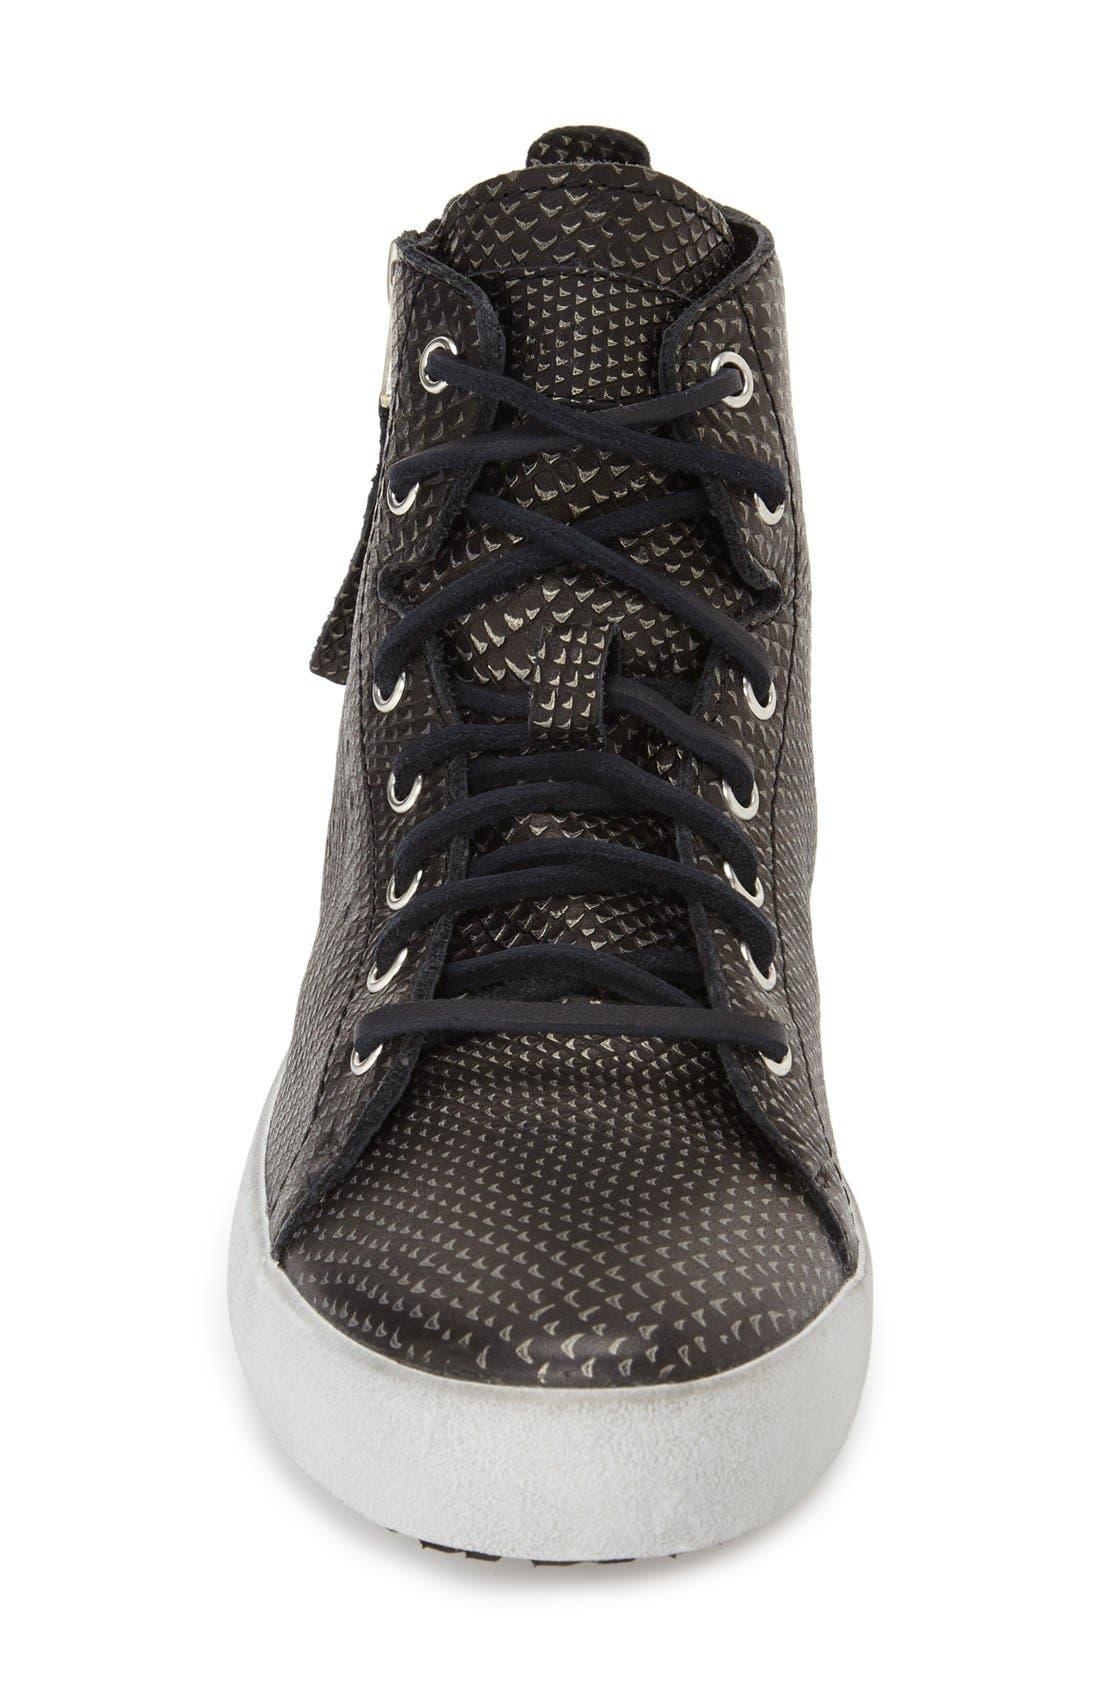 BLACKSTONE,                             'KL57' High Top Sneaker,                             Alternate thumbnail 3, color,                             006